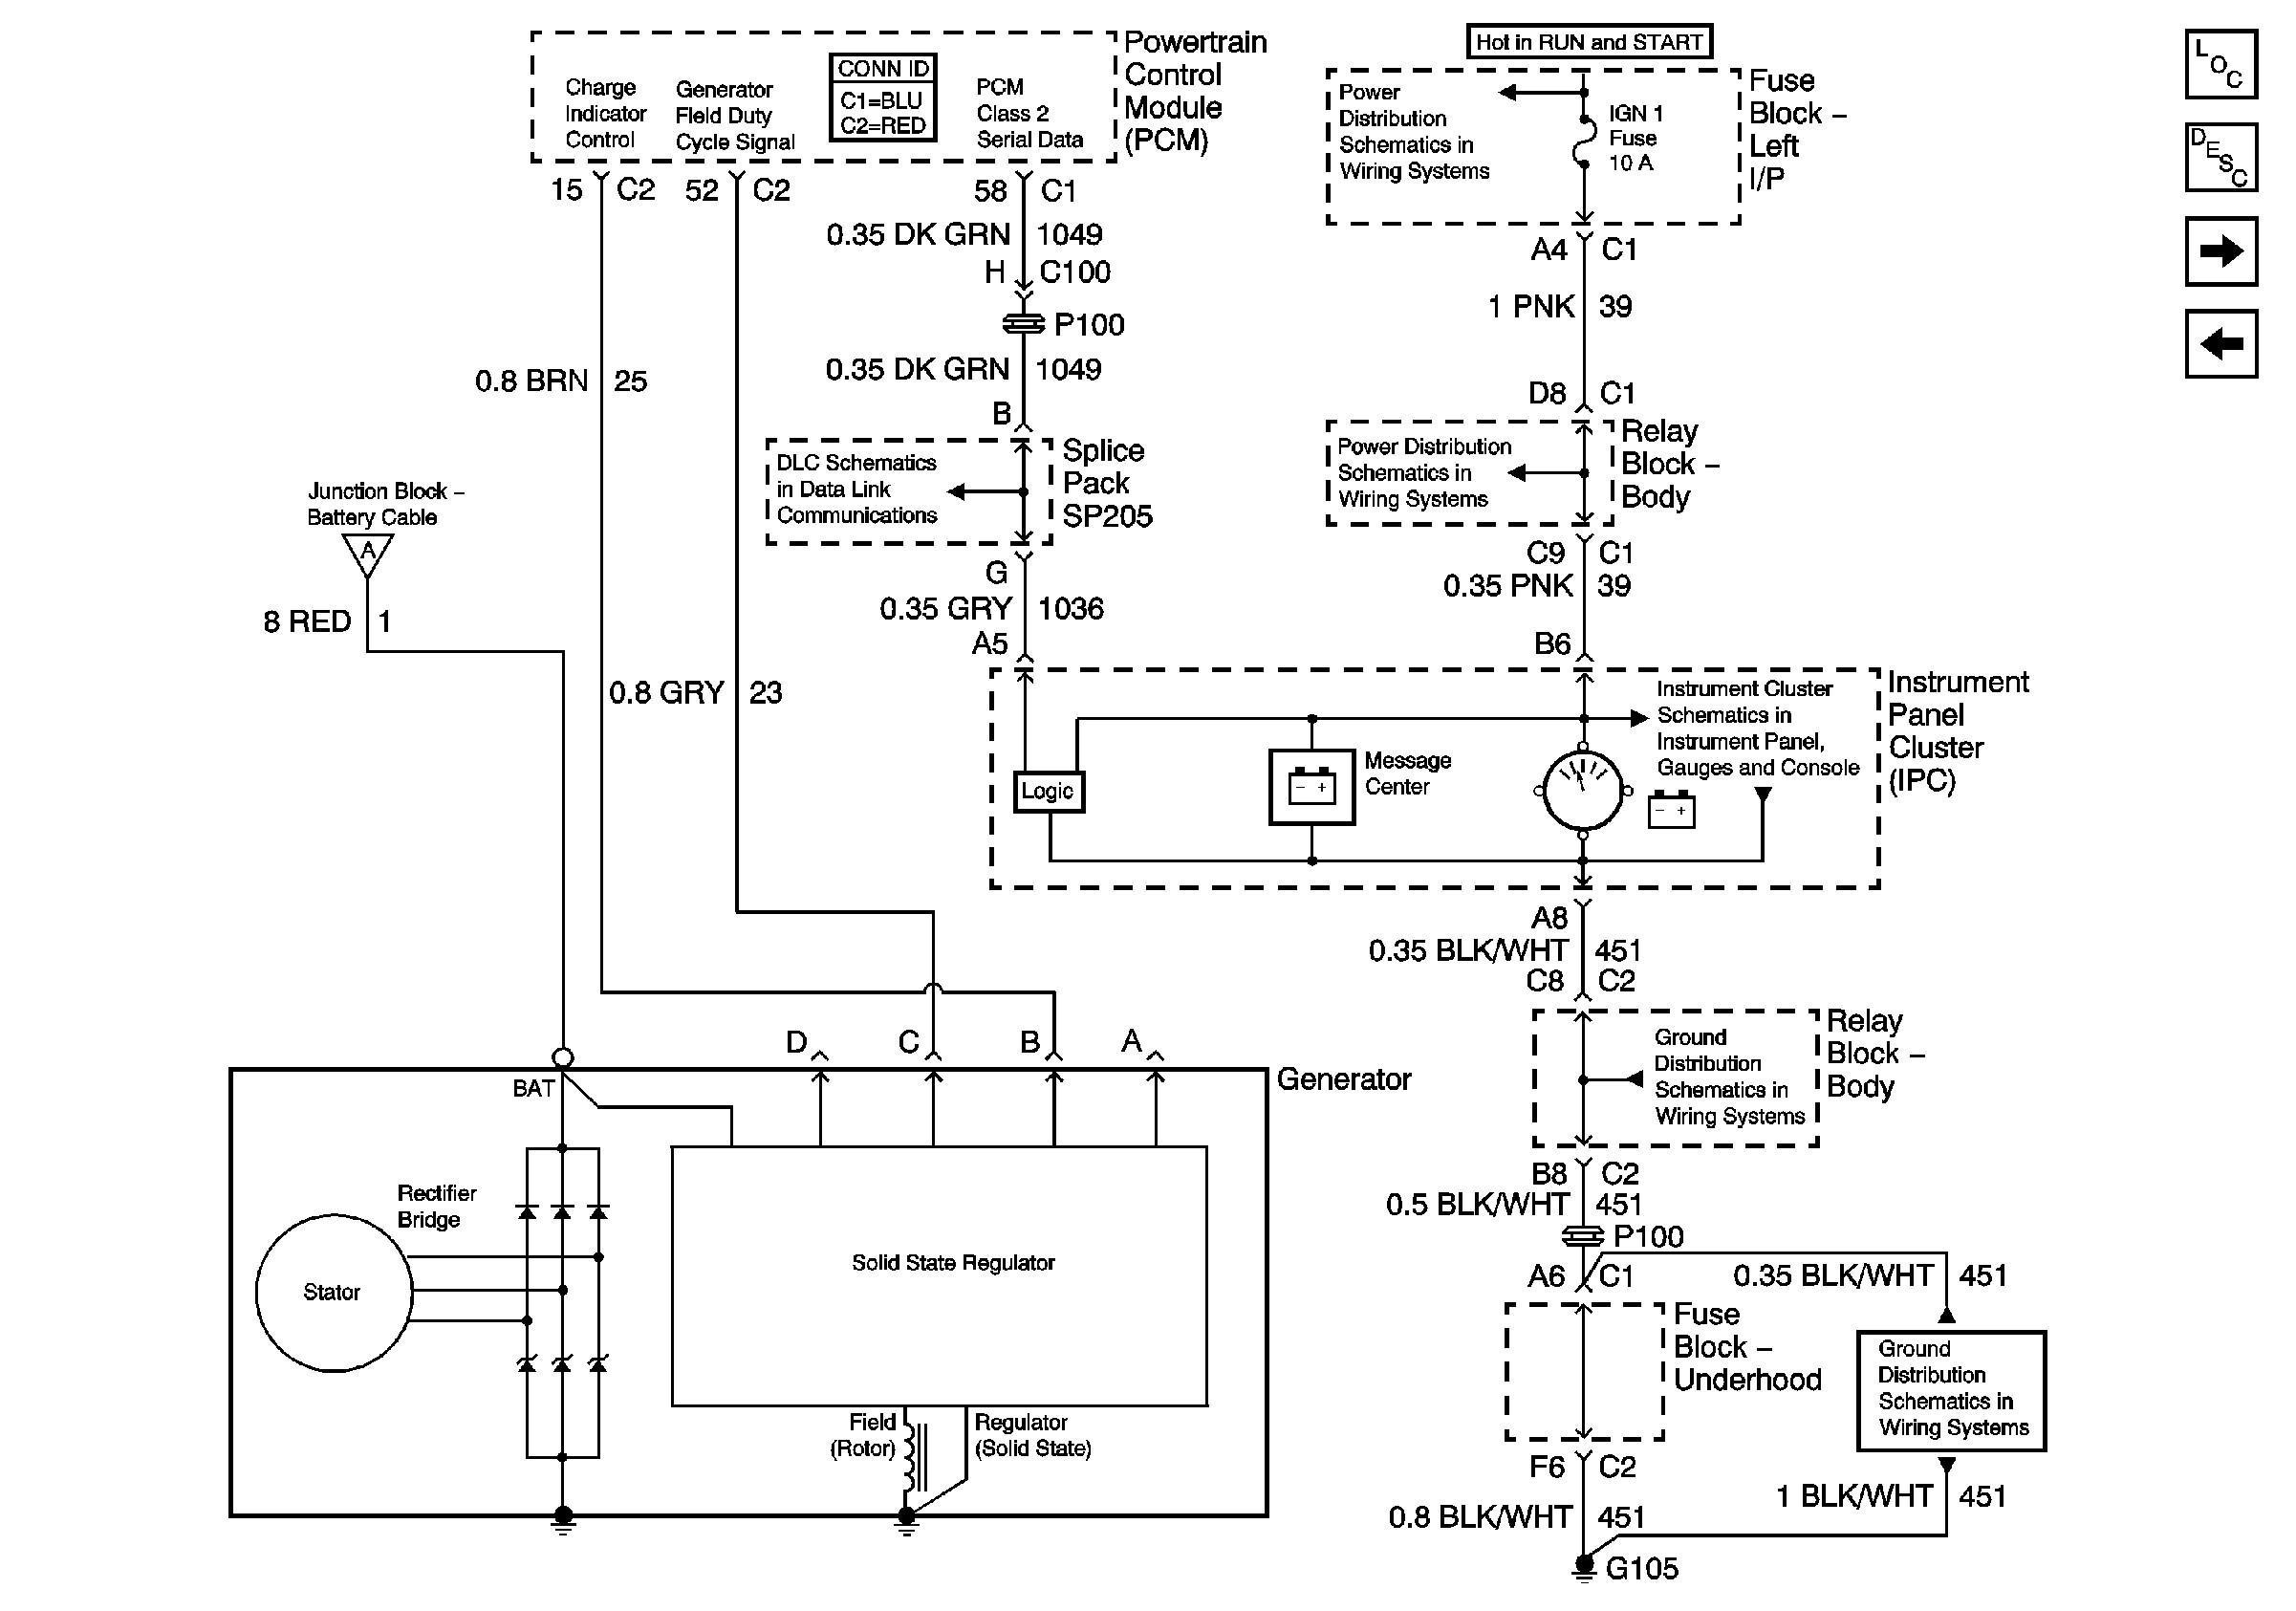 1998 Gmc Sierra Wiring Diagram 2006 Gmc Sierra Wiring Diagram Wiring Data Of 1998 Gmc Sierra Wiring Diagram